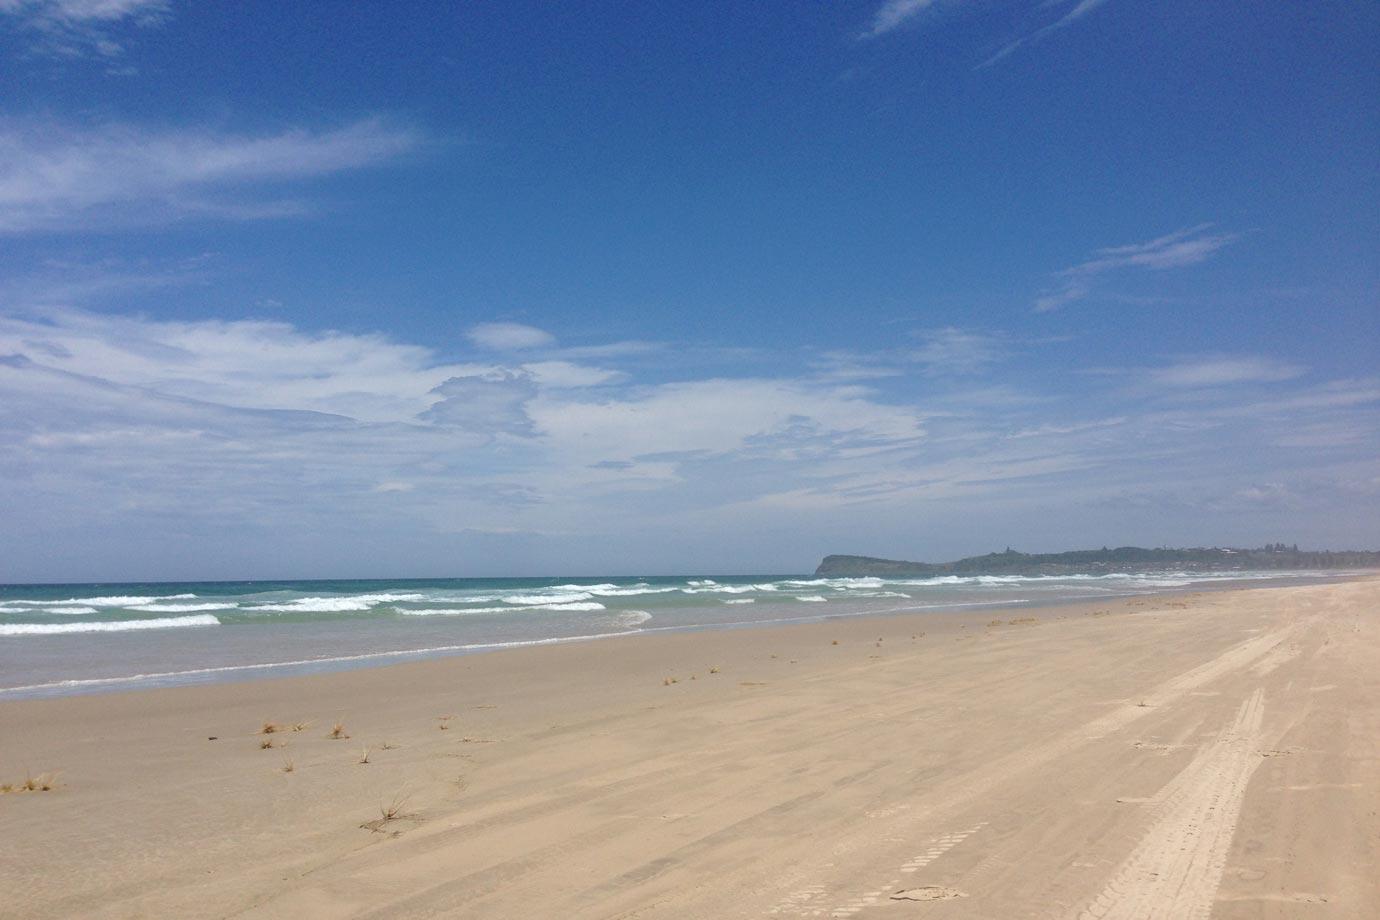 7 Mile Beach, outside of Byron Bay